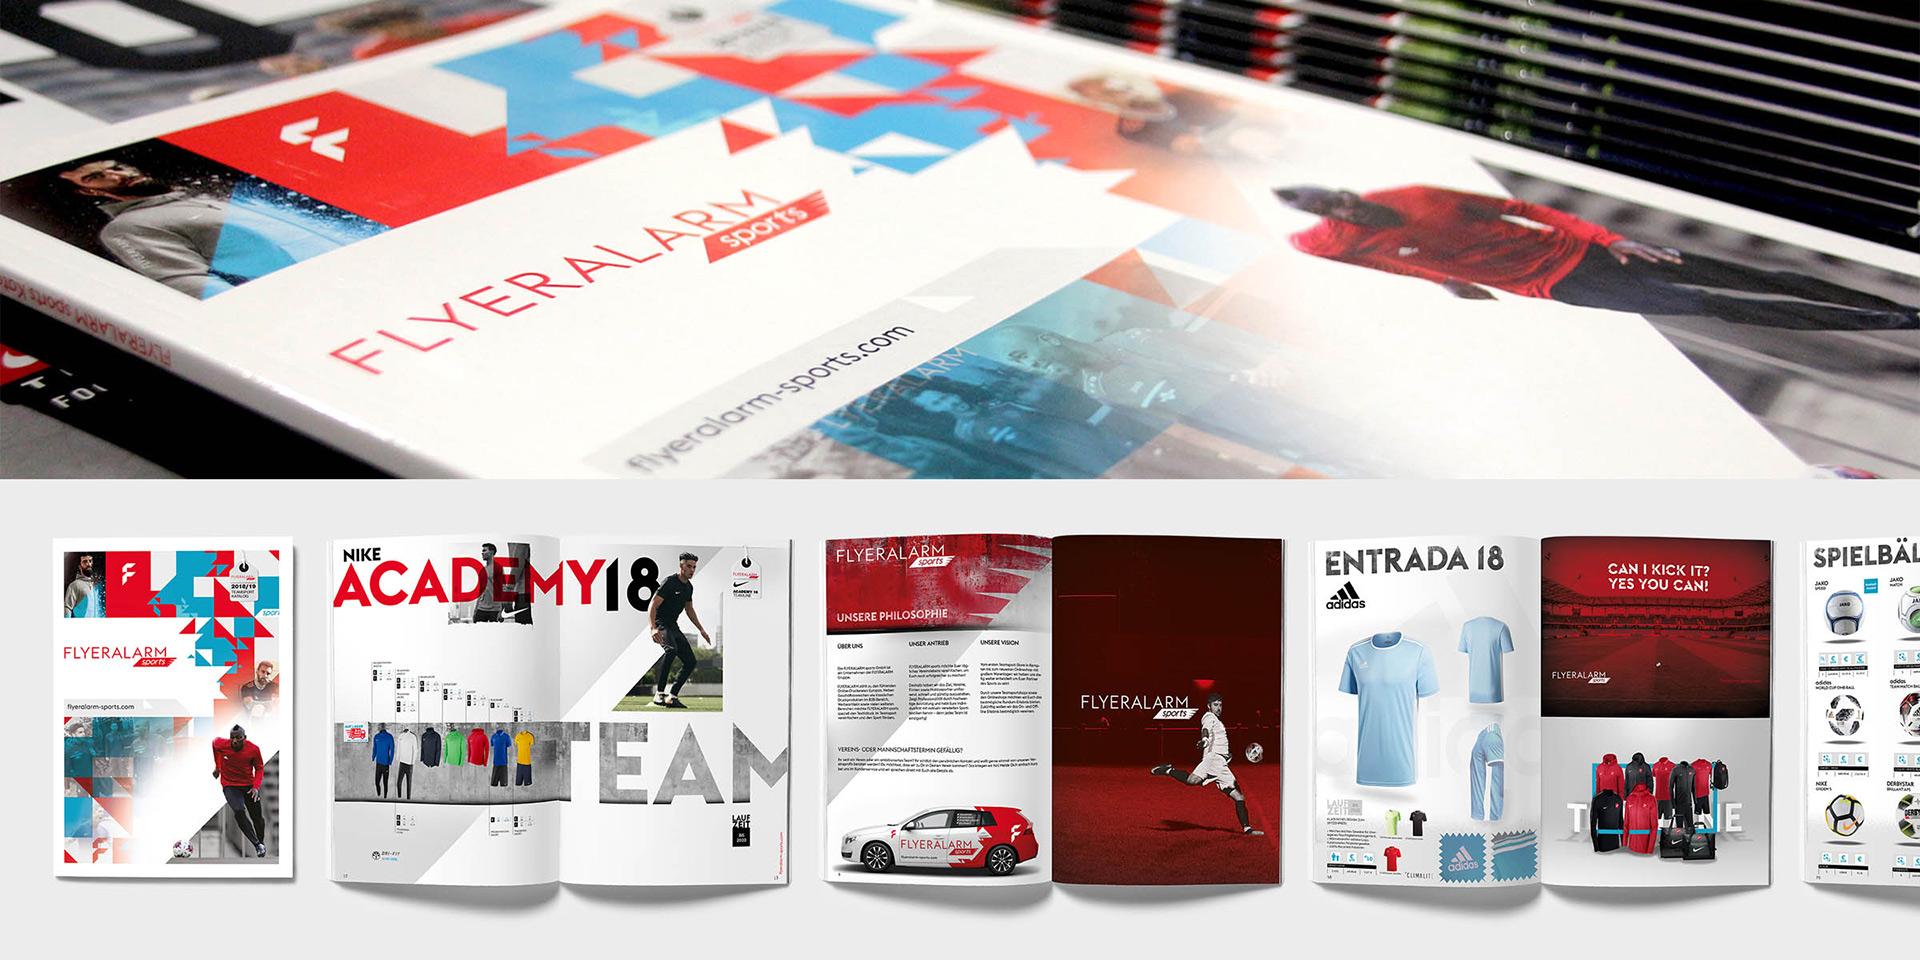 4 gfd gregor fenger designworks for fa sports de branding corporate design smm sma social media marketing online